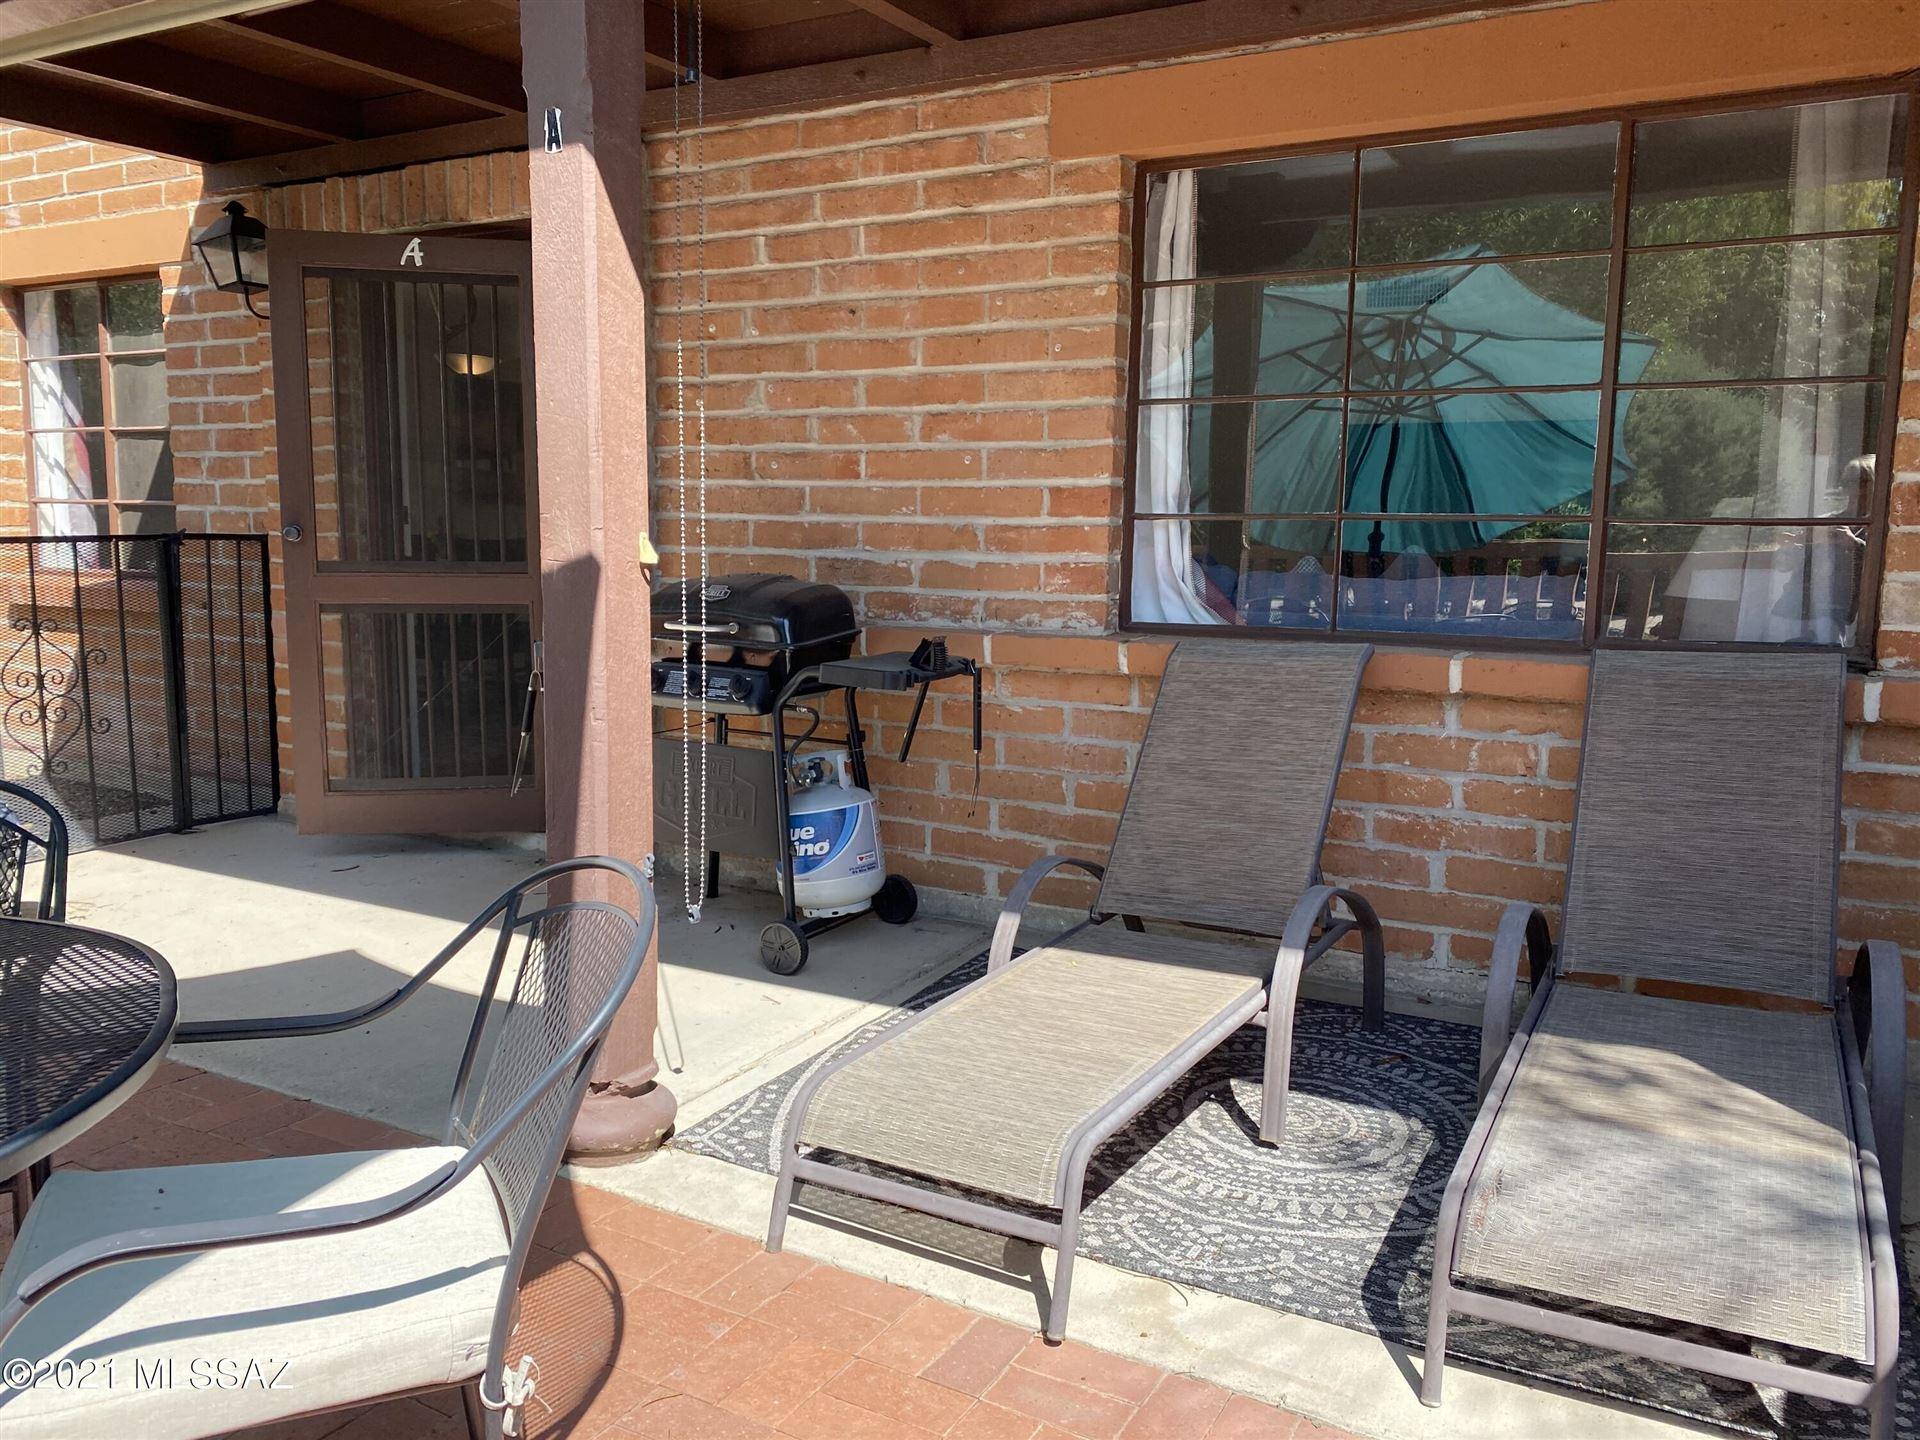 387 S Paseo Tierra #A, Green Valley, AZ 85614 - MLS#: 22123252